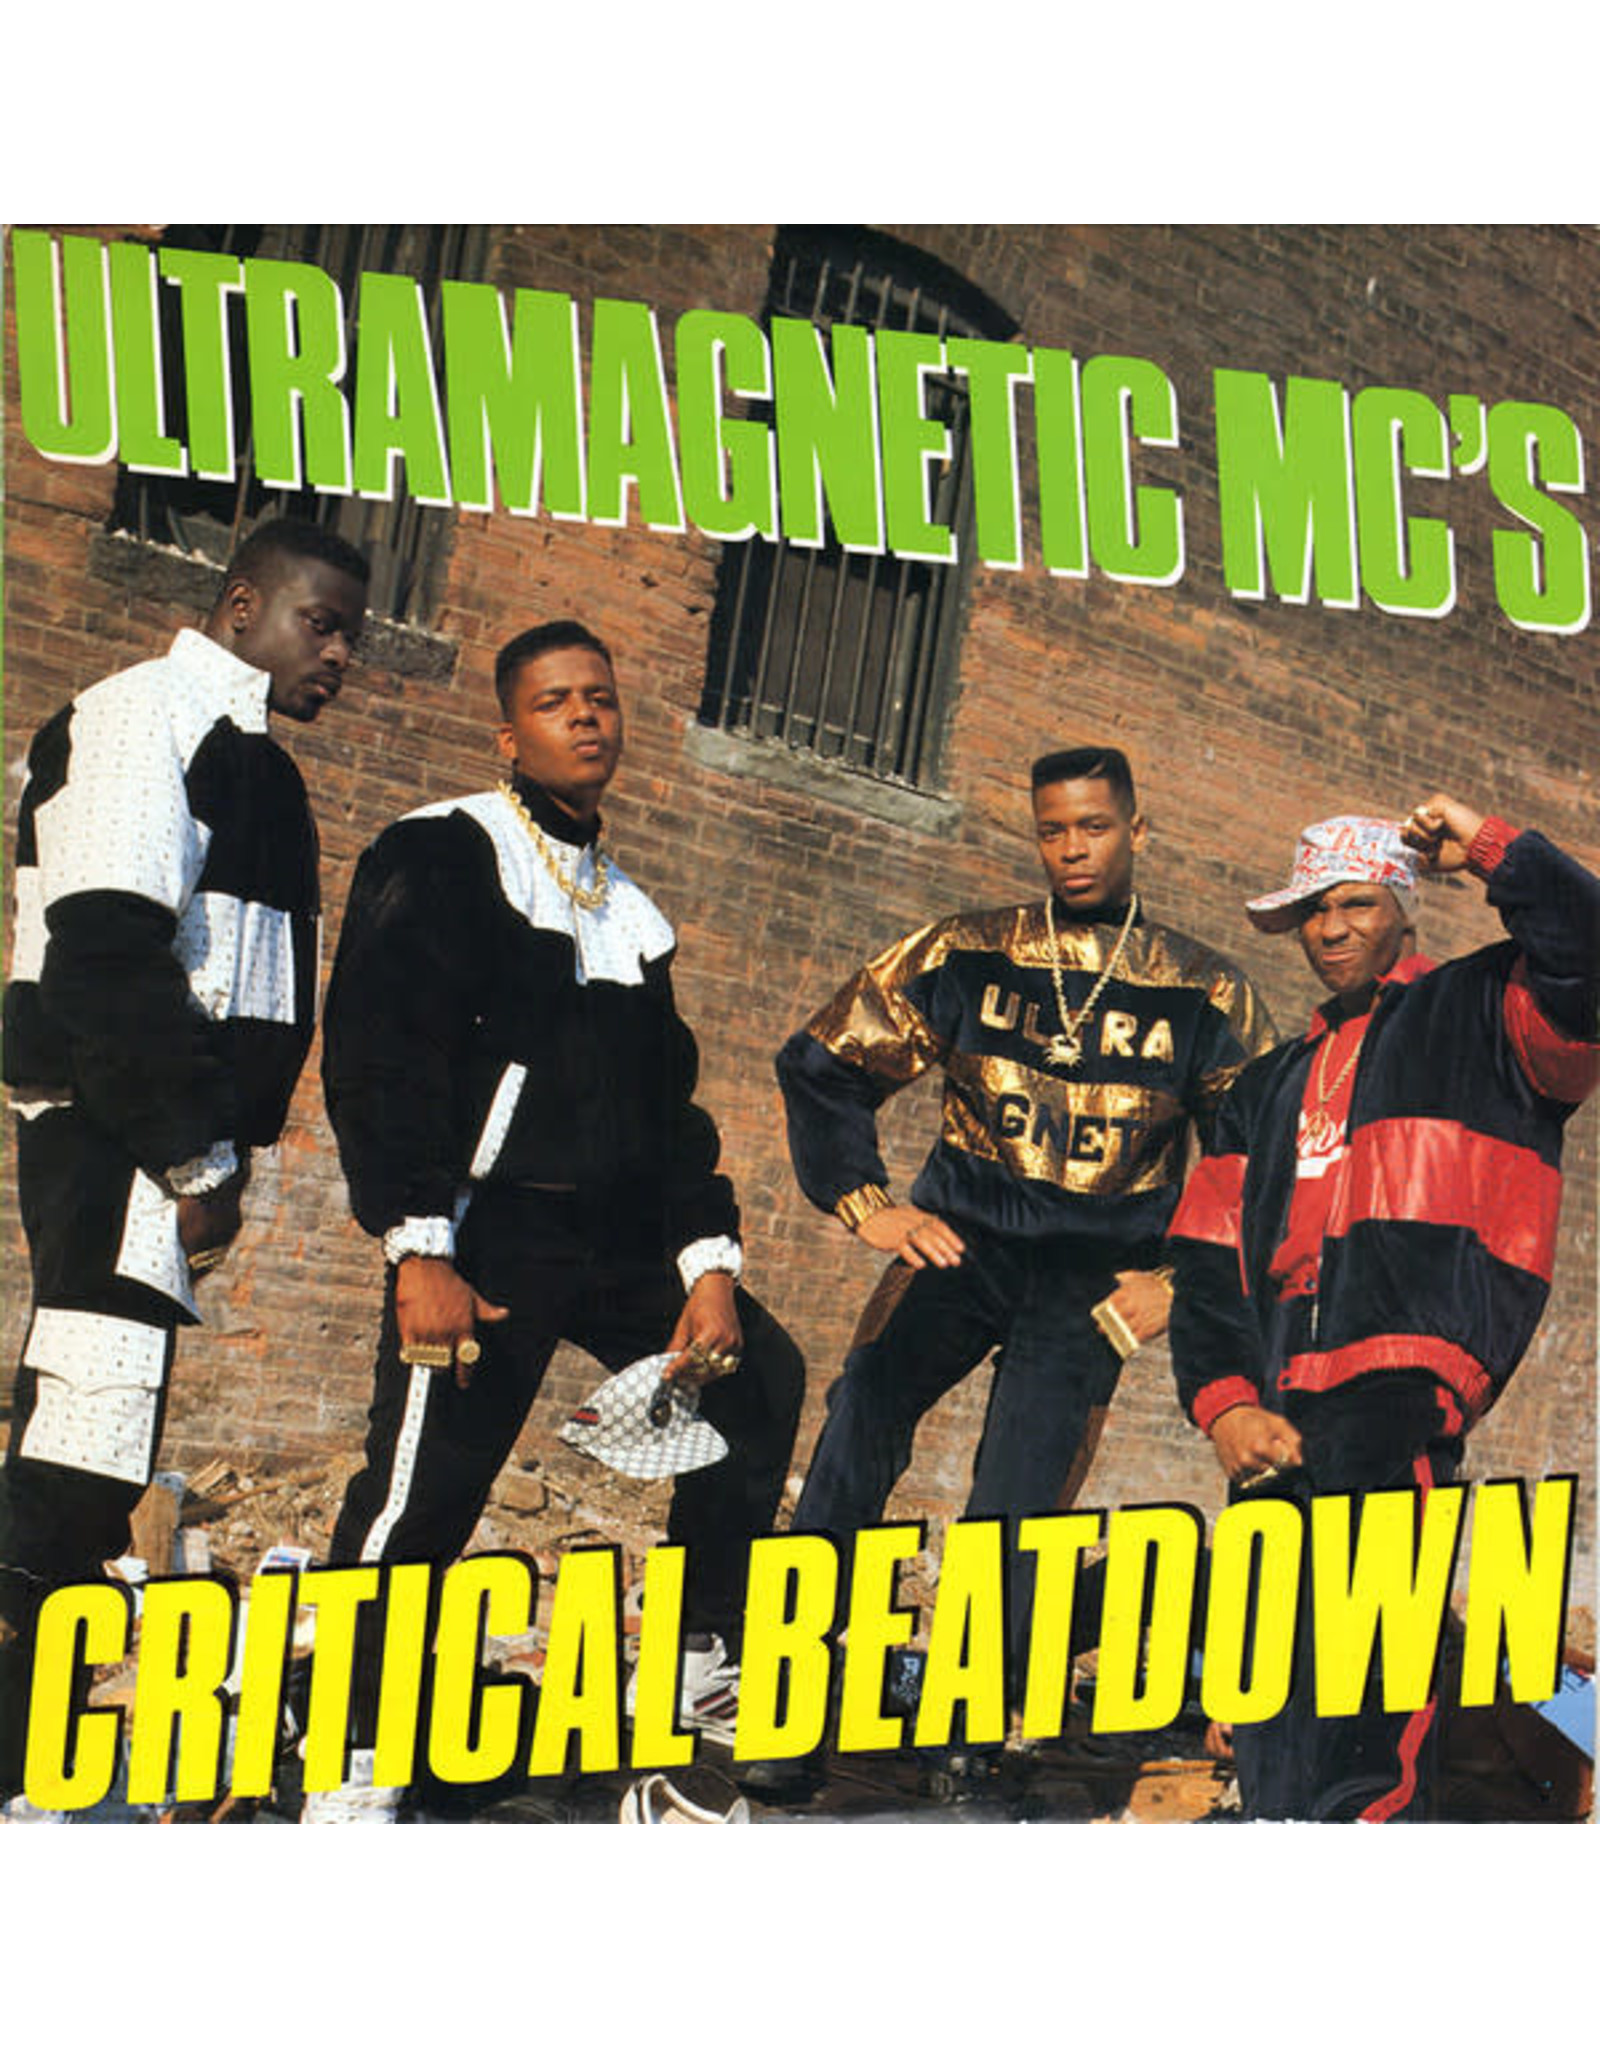 New Vinyl Ultramagnetic MC's - Critical Beatdown (Expanded Edition) [EU Import, Colored] 2LP